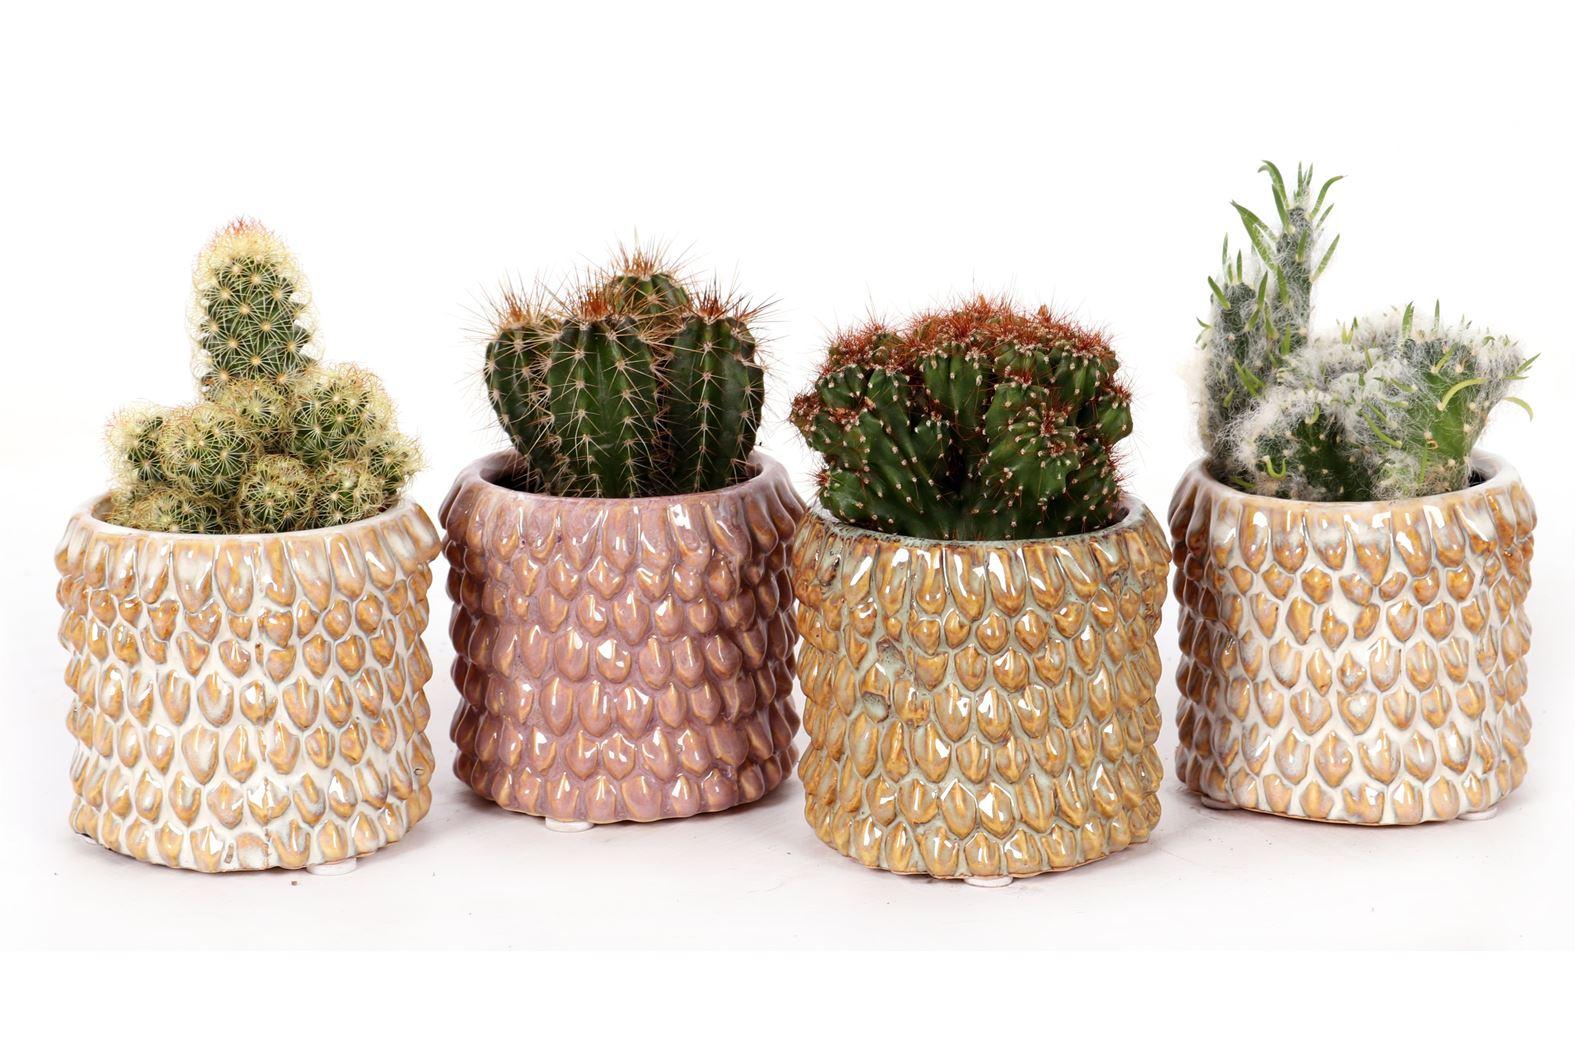 cactus gemengd in casablanca keramiek